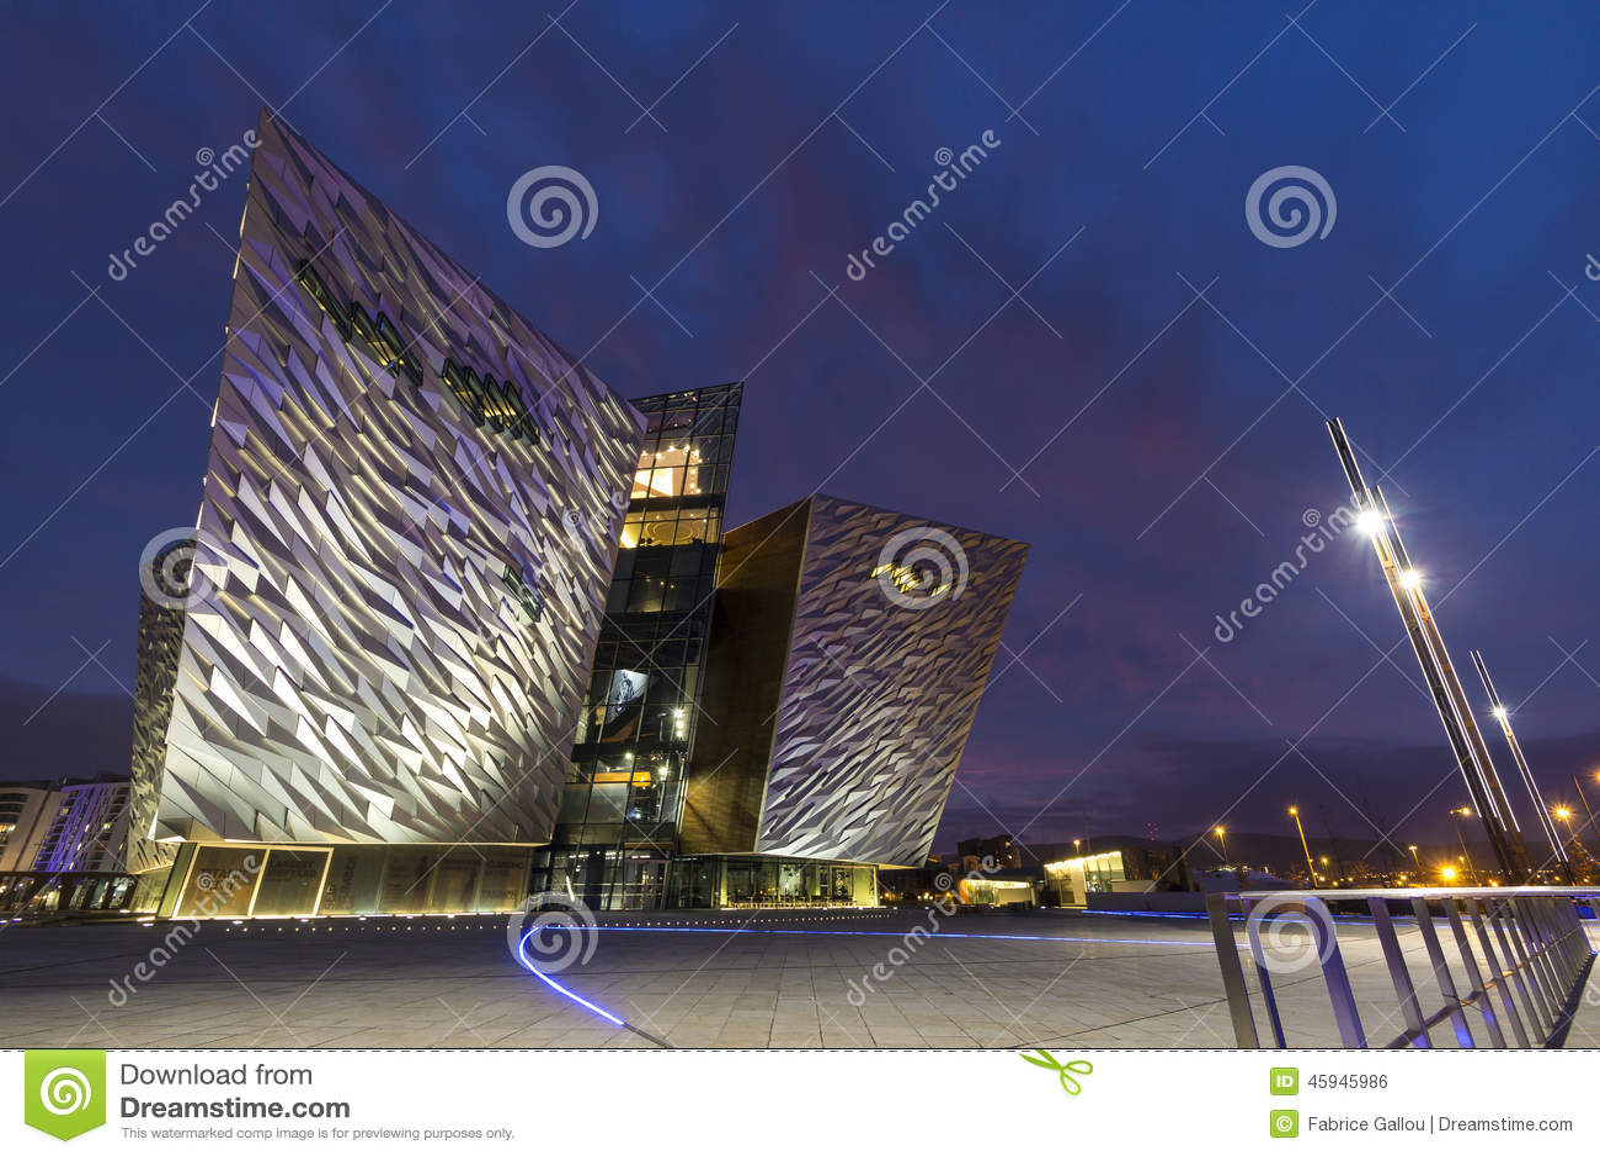 The Titanic Belfast Experience